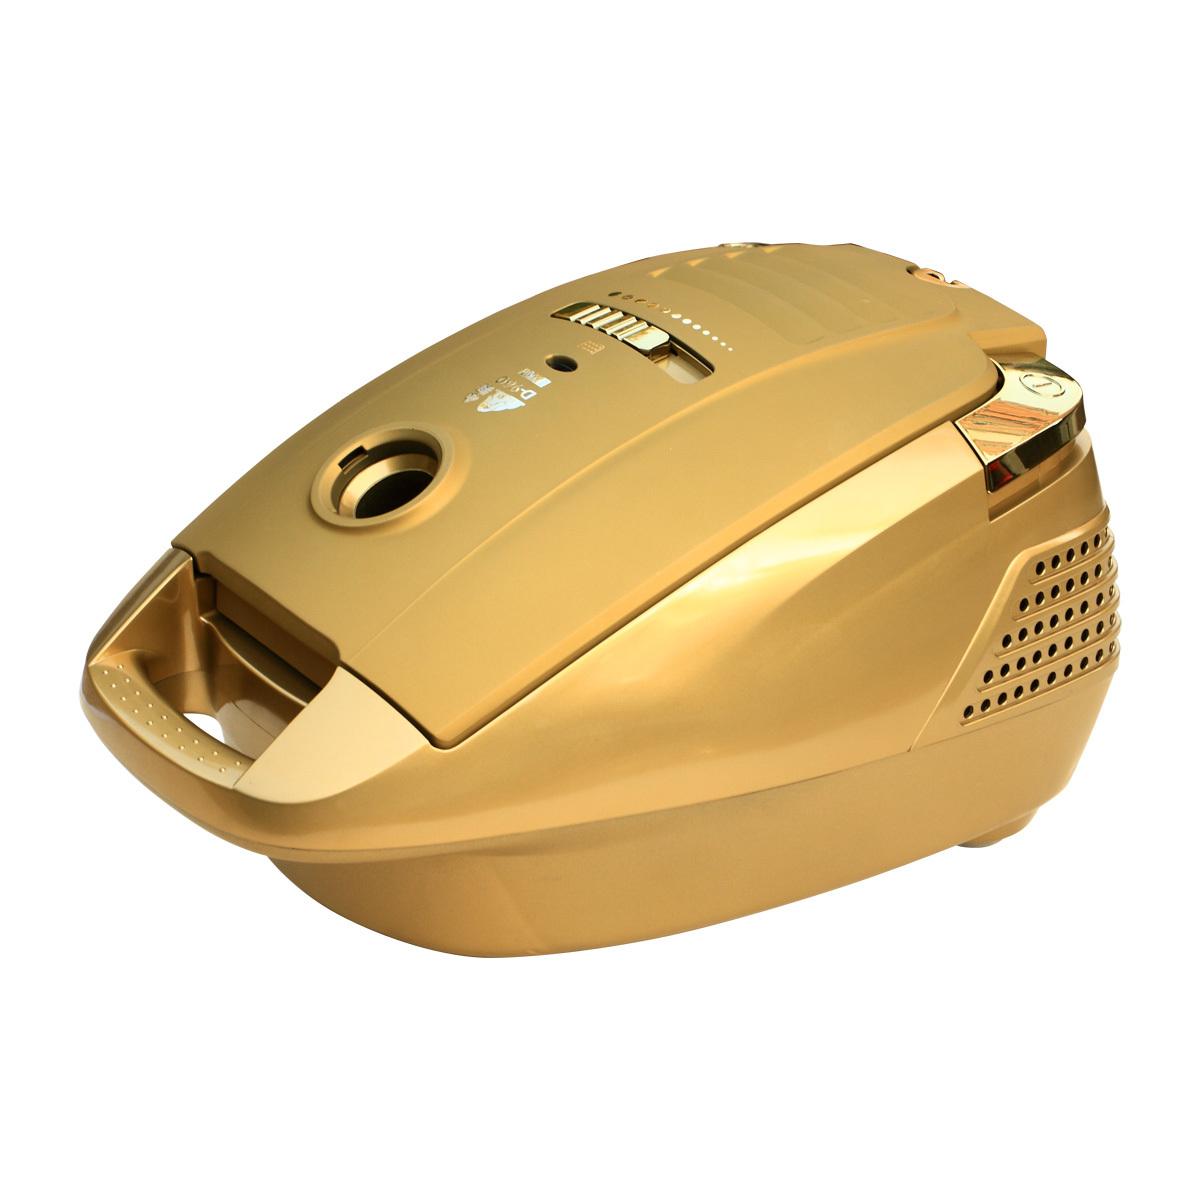 小狗吸尘器D-960